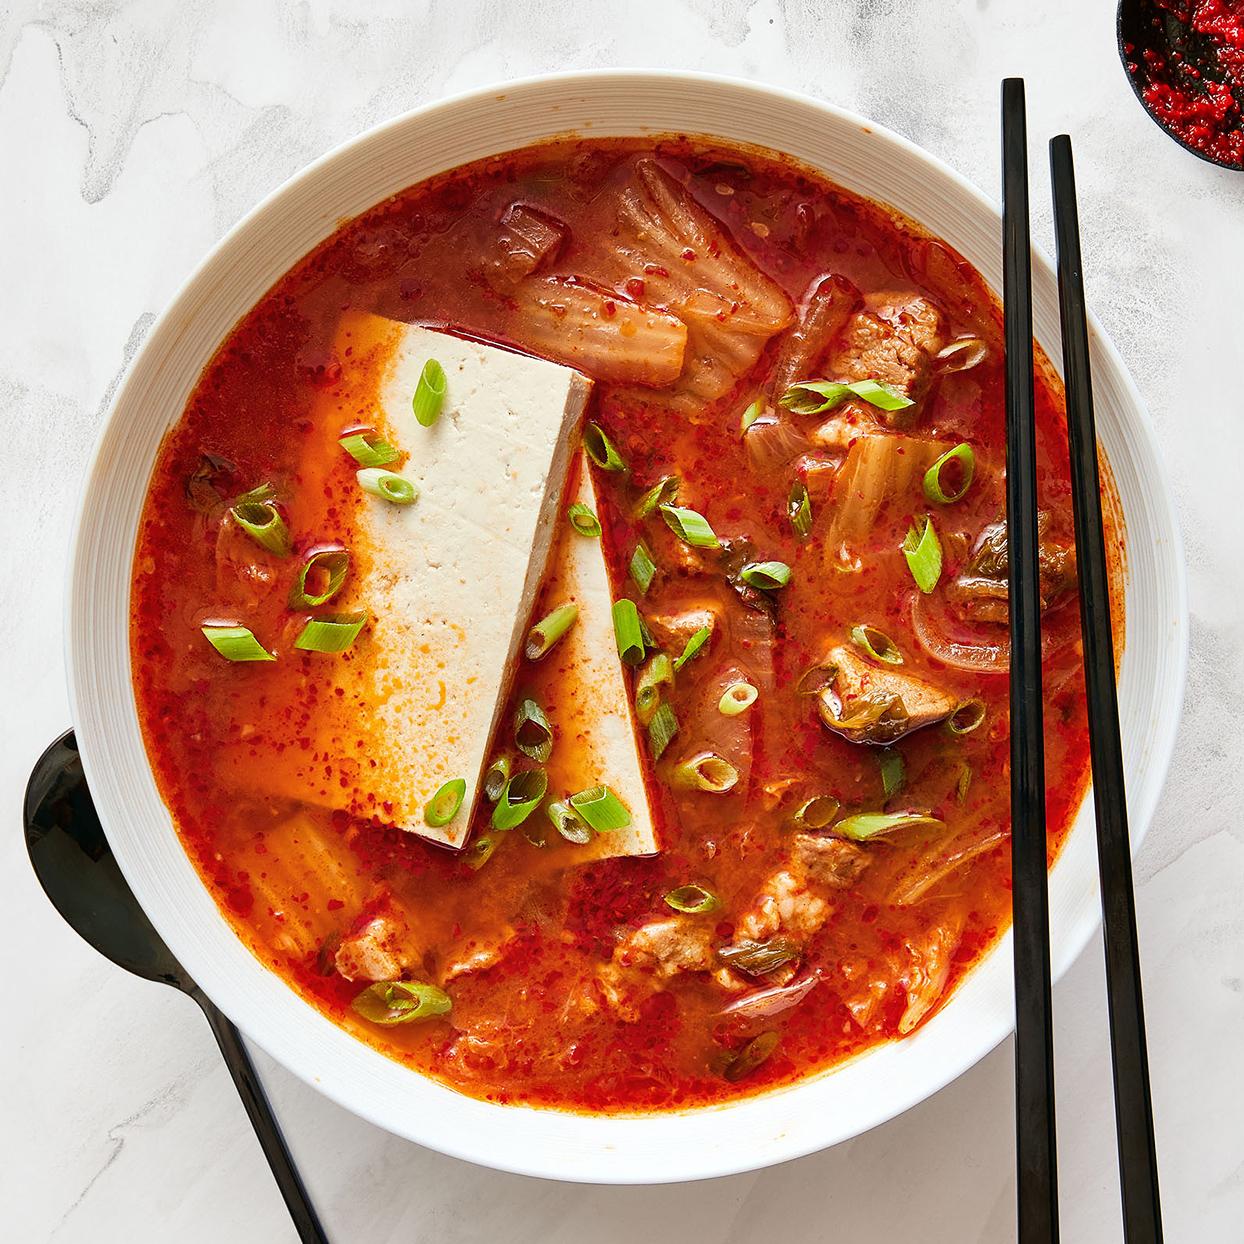 Kimchi-Jjigae (Kimchi Stew)